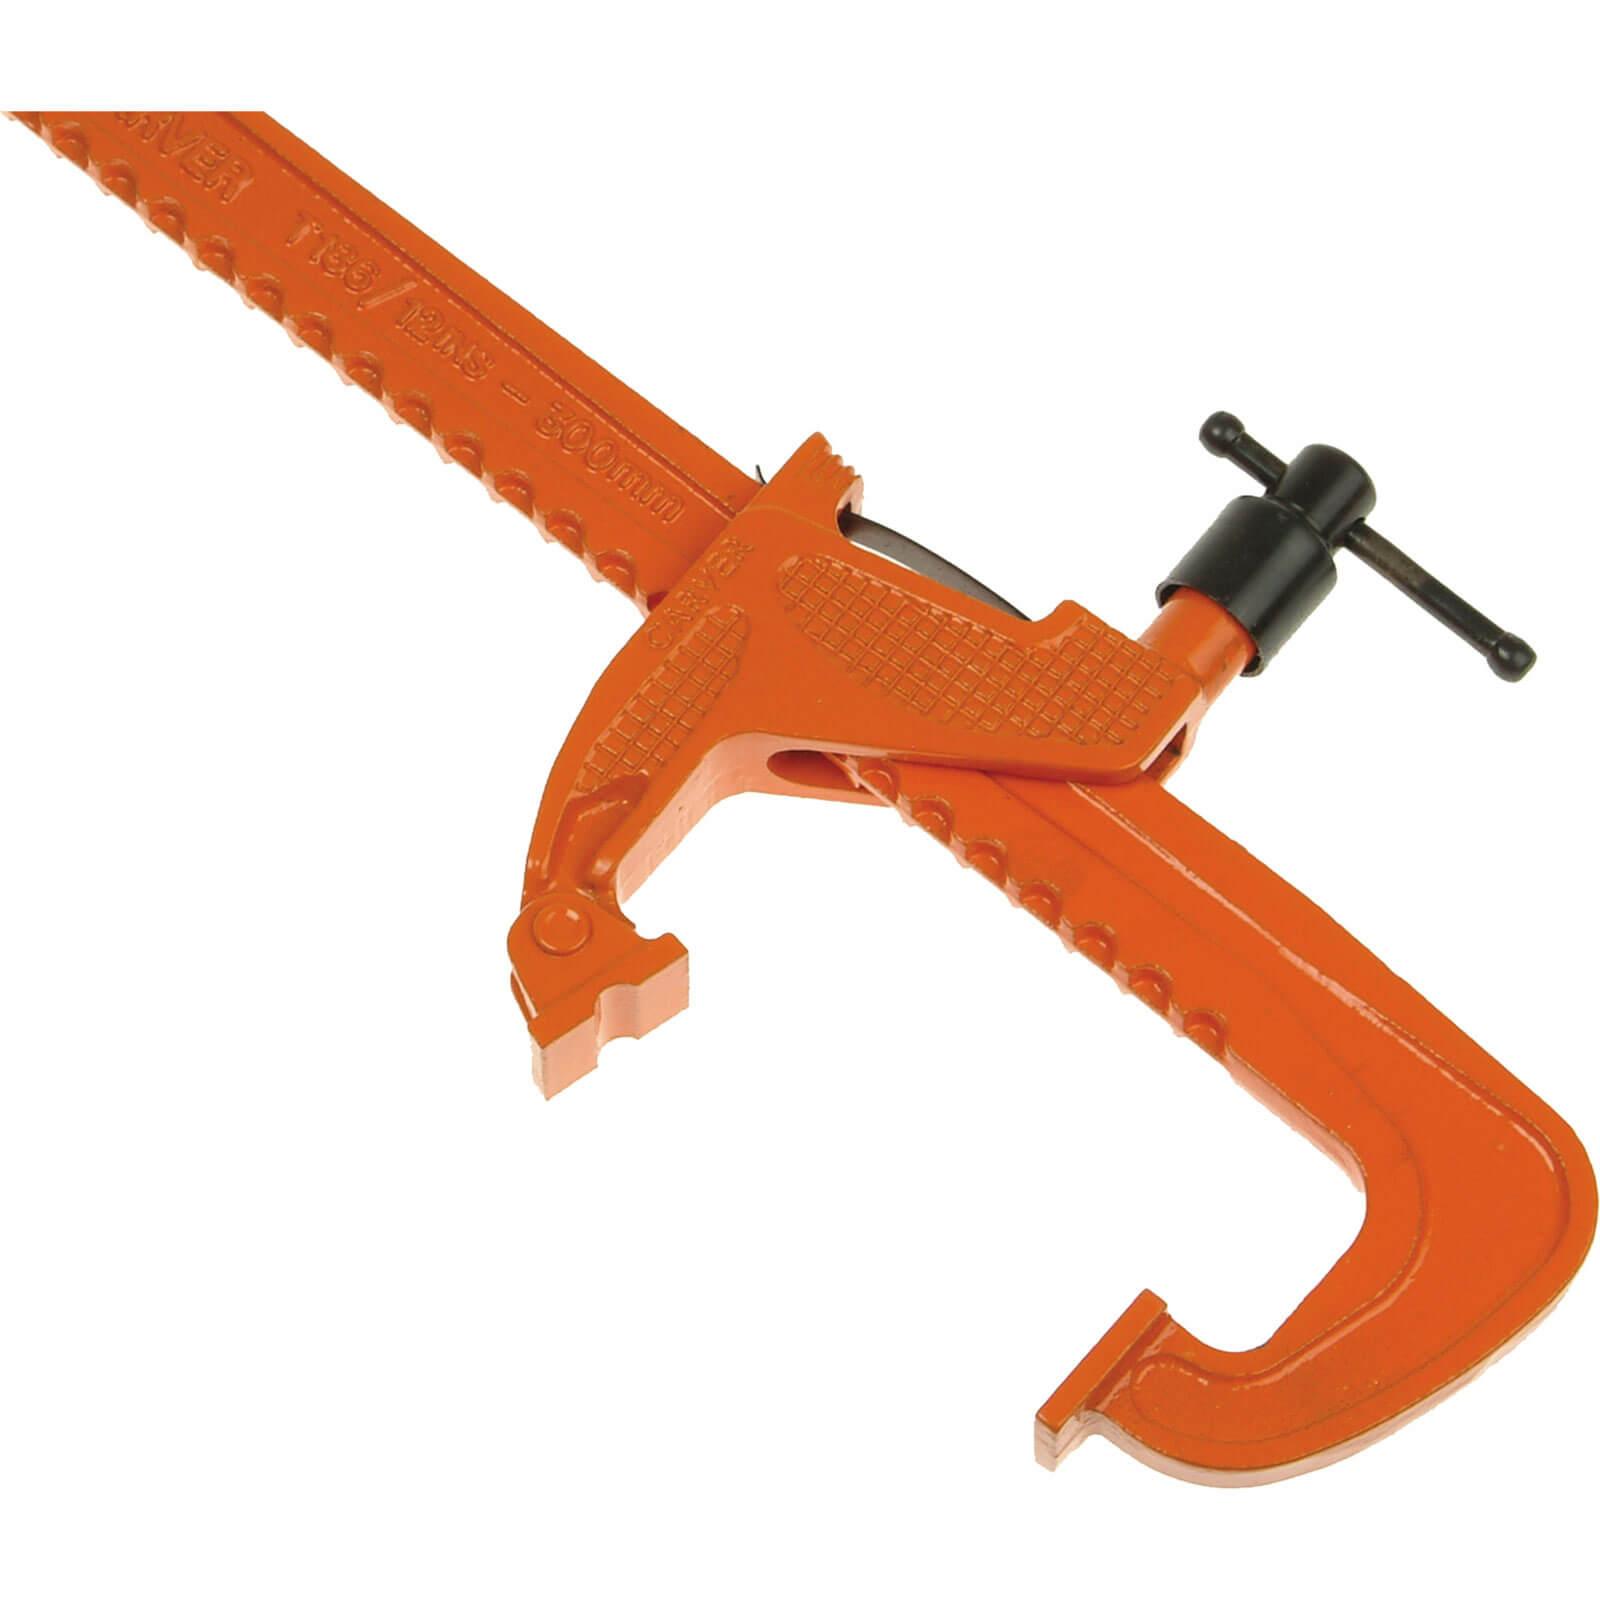 Image of Carver T186 Standard Duty Rack Clamp 500mm